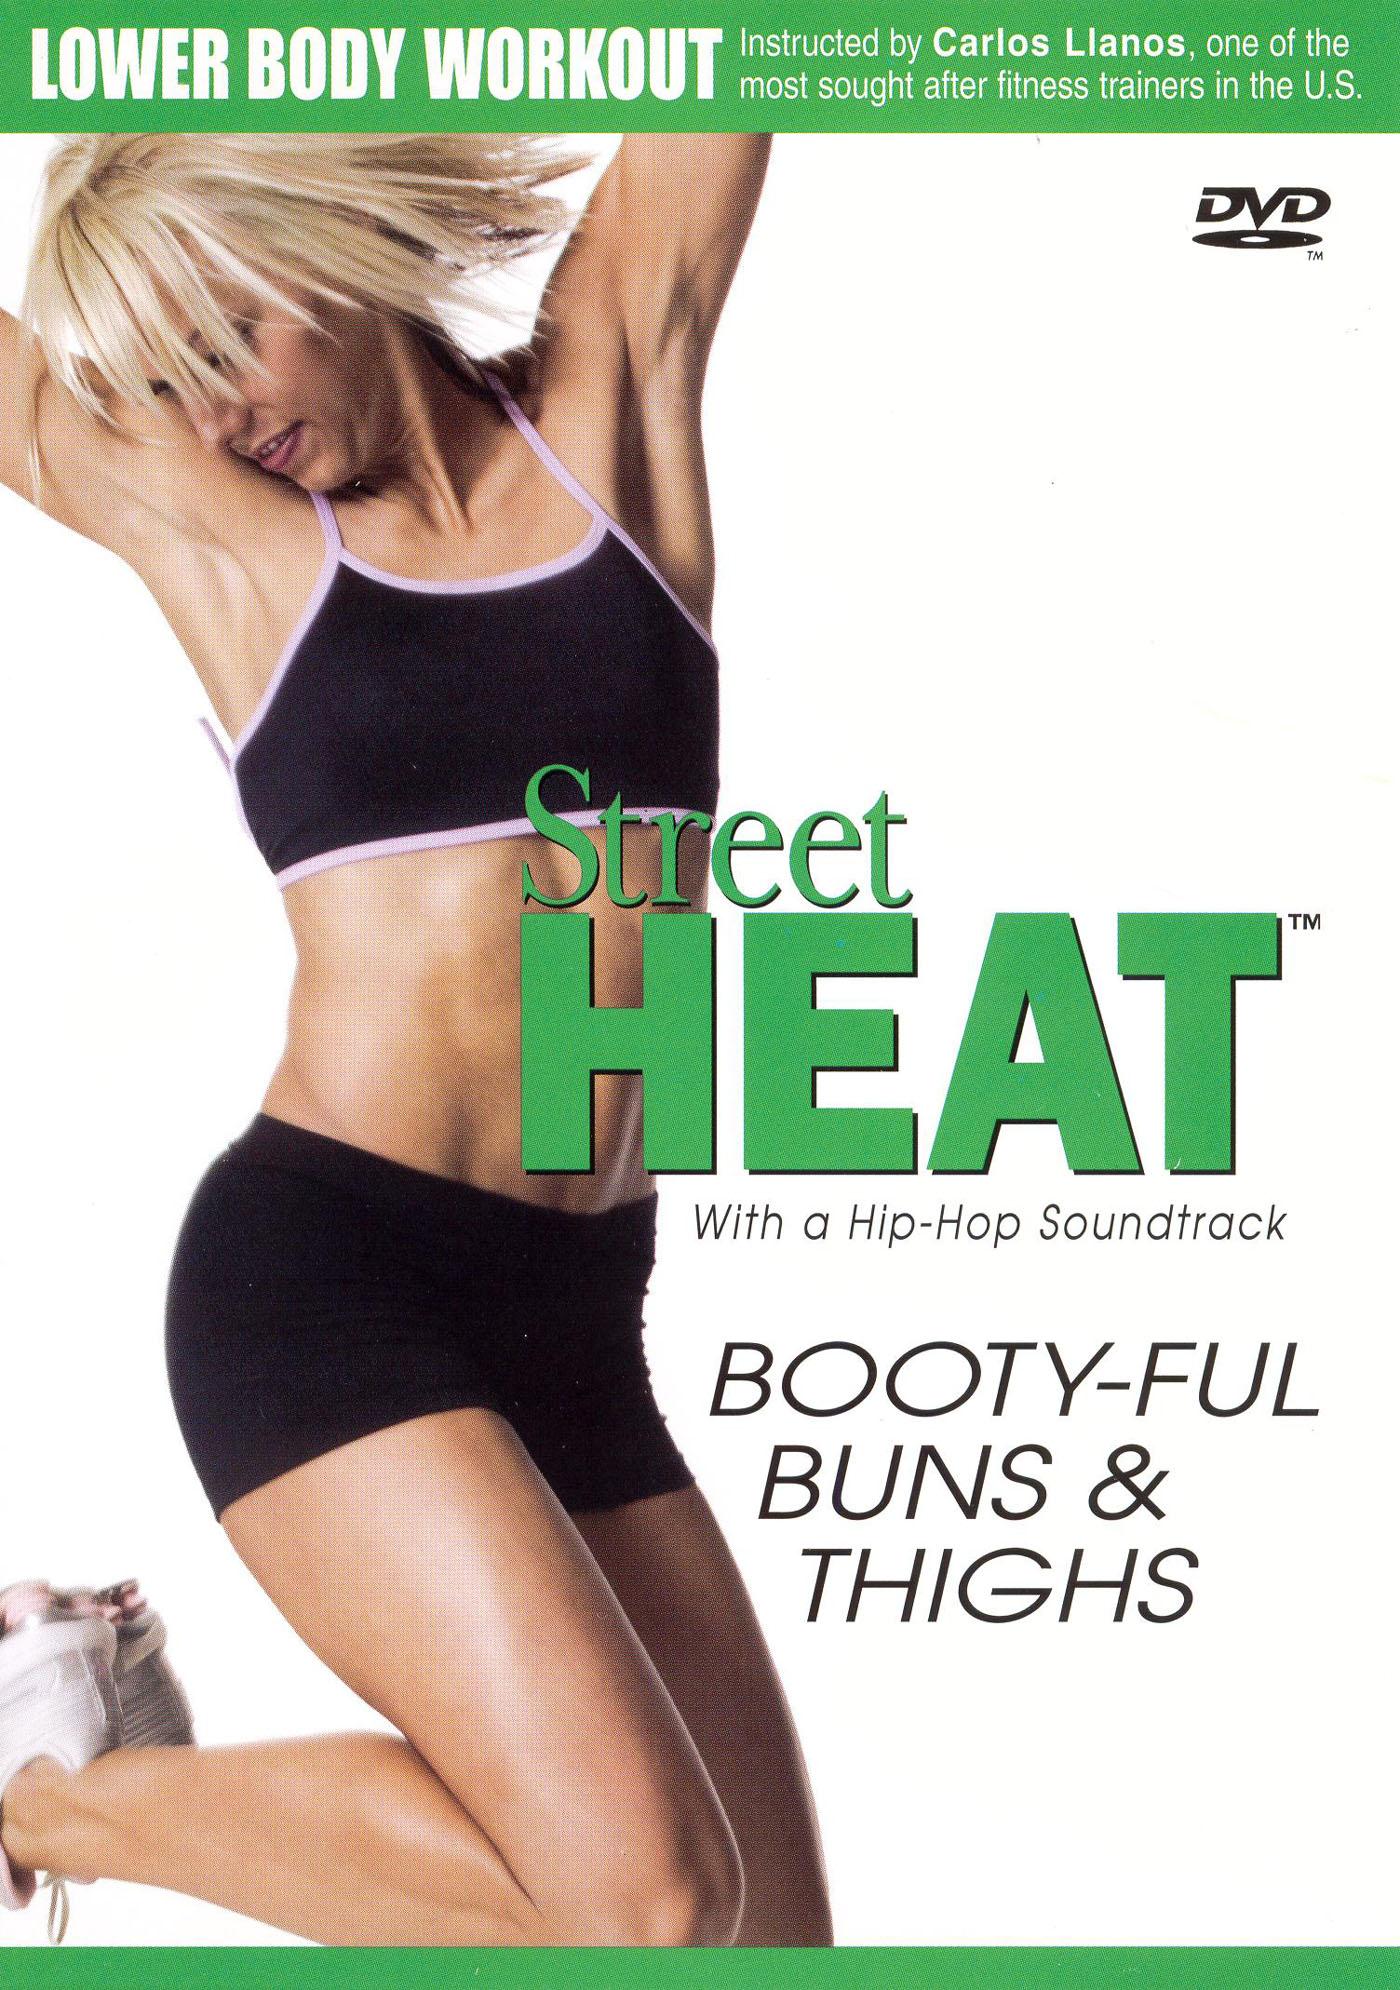 Street Heat: Booty-ful Buns & Thighs